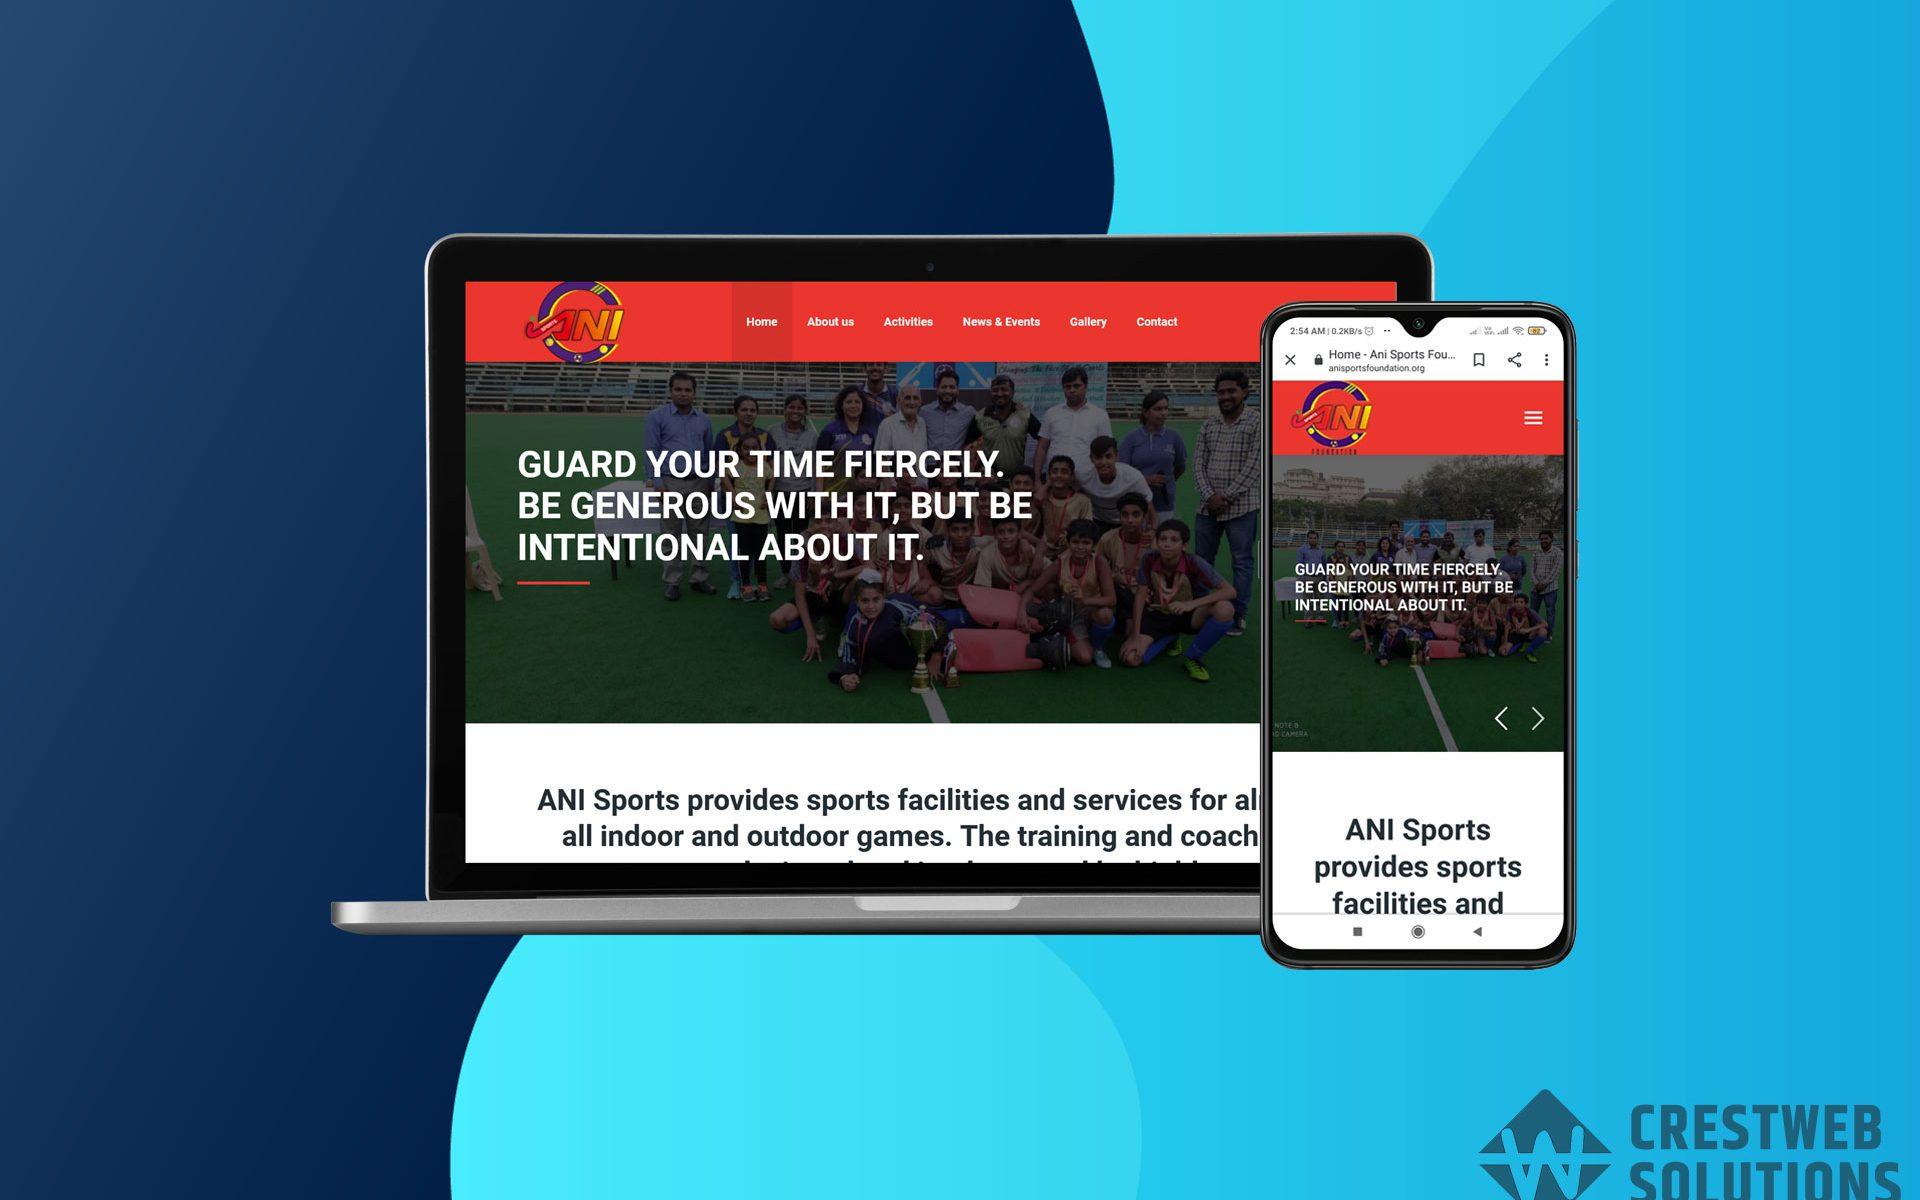 anisports-foundation-responsive-website-in-mumbai-crestweb-solutions